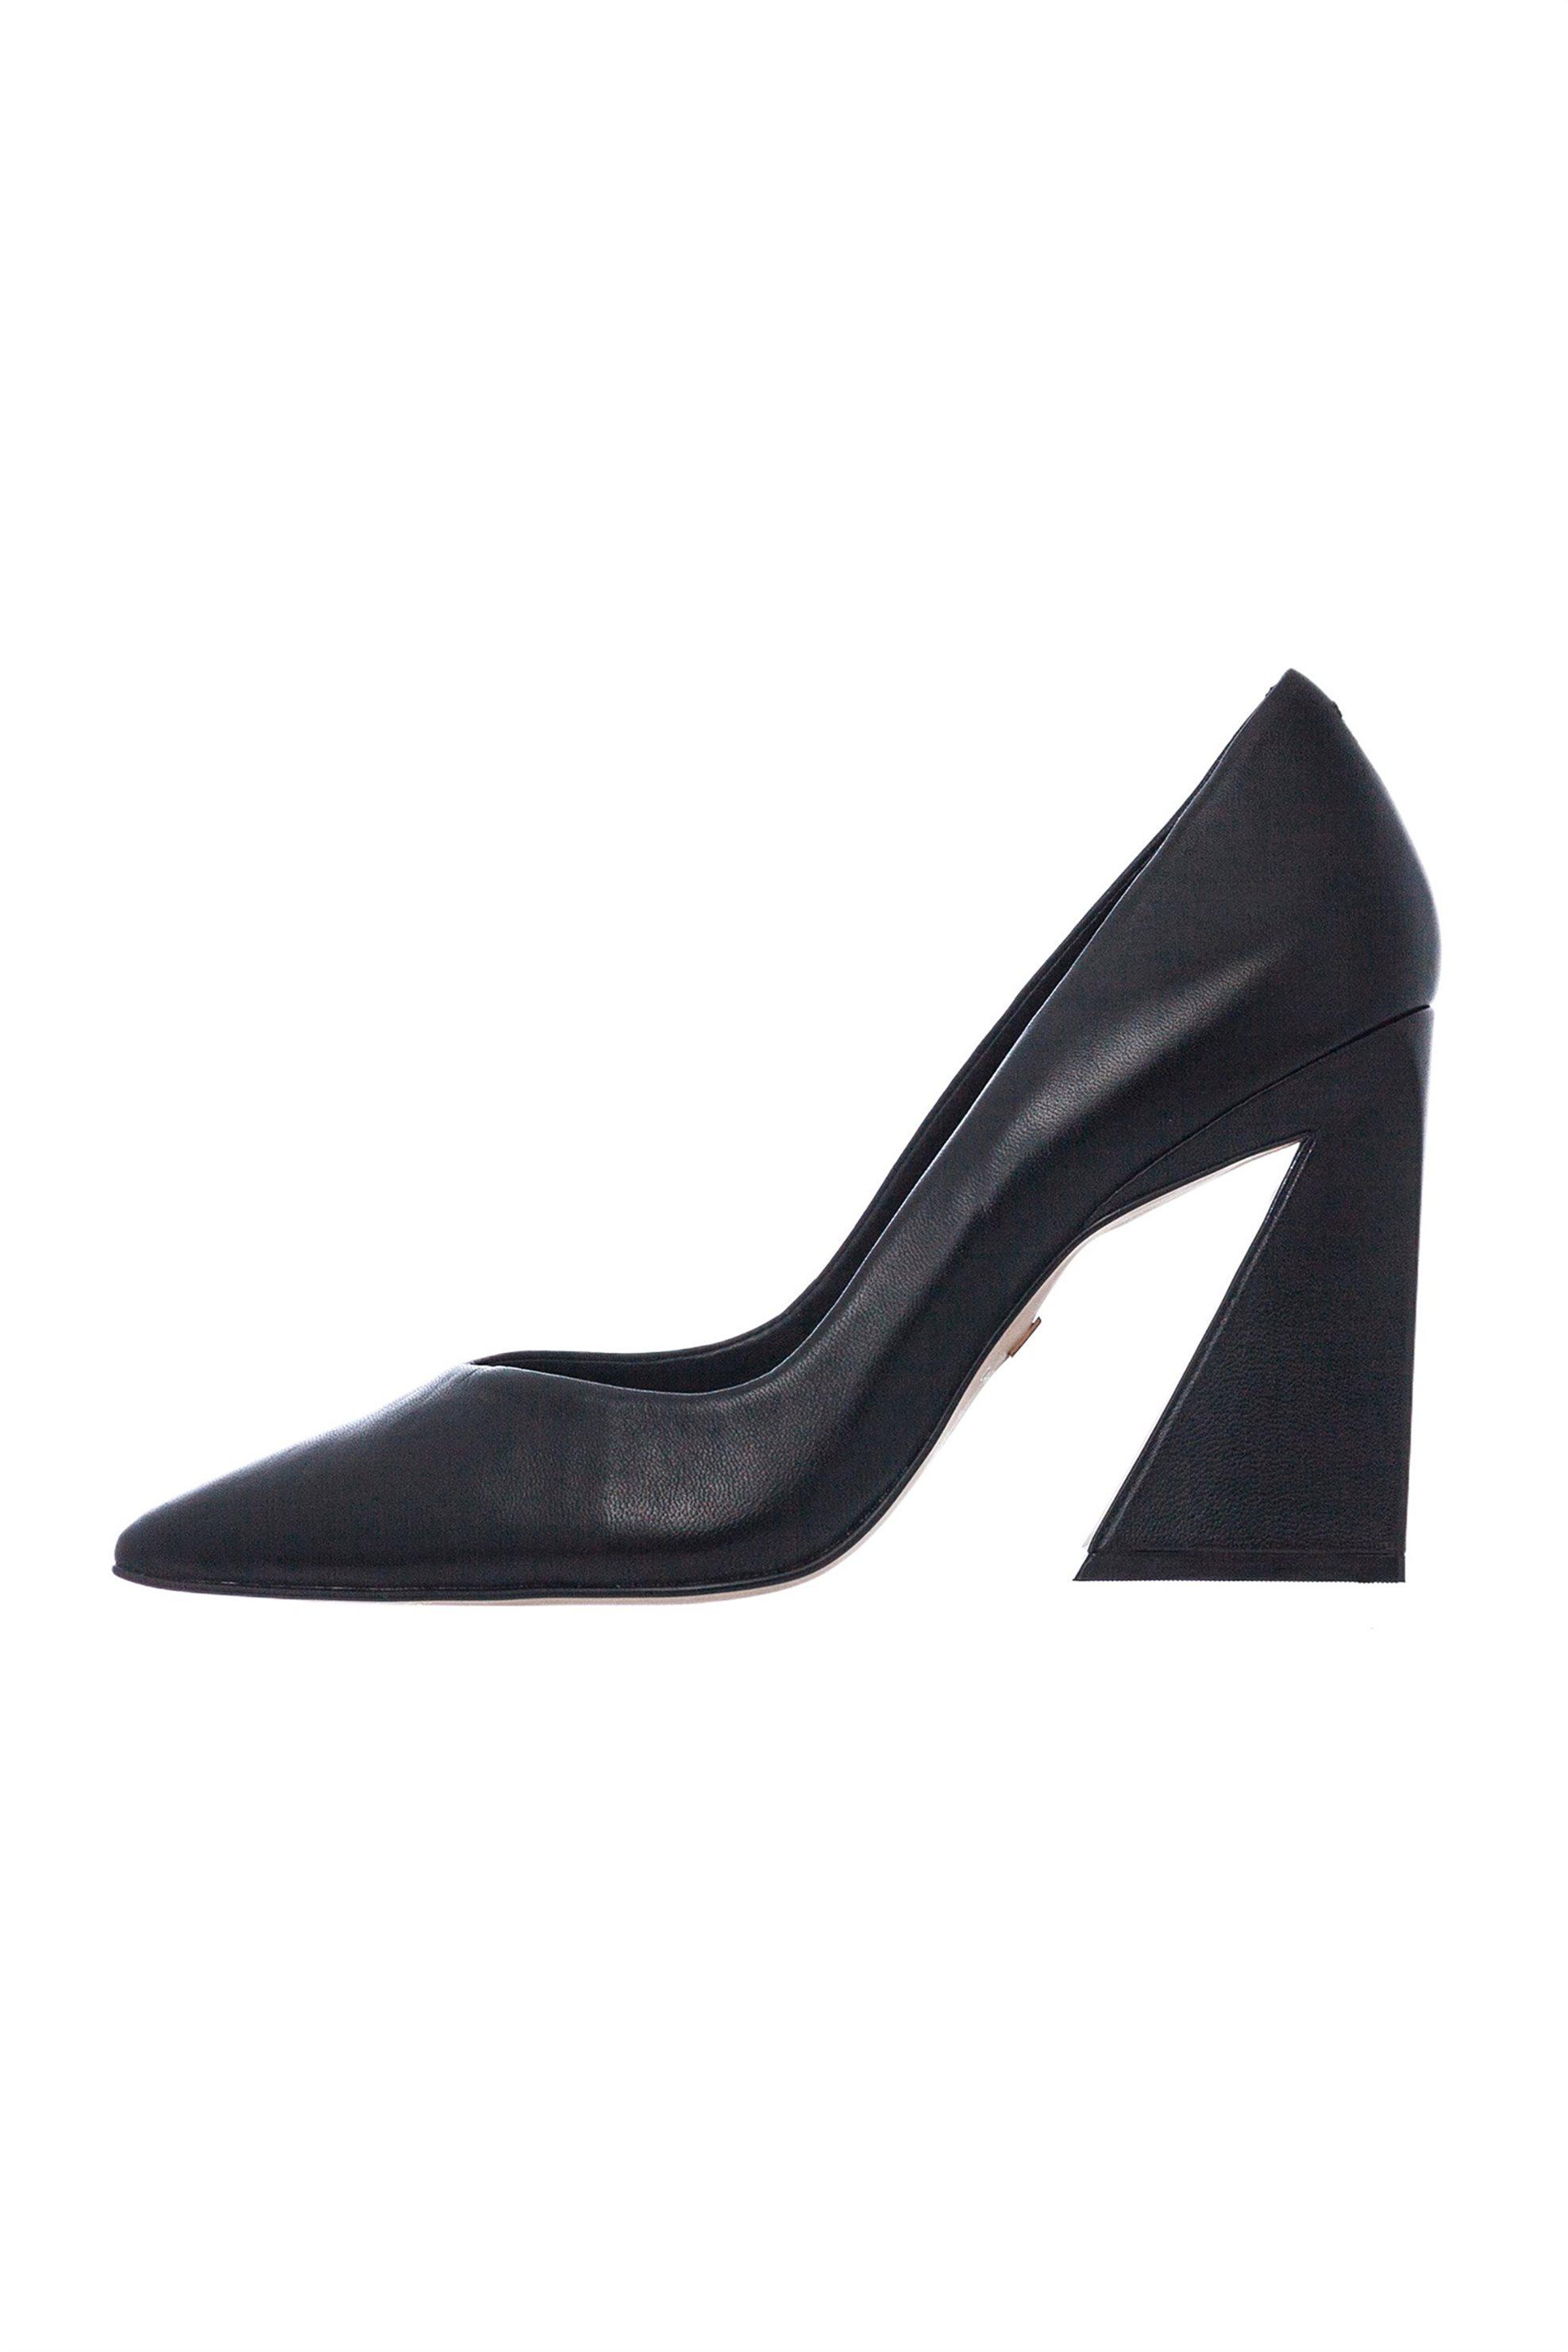 Carrano γυναικείες γόβες με τριγωνικό τακούνι – 264001 CAB01 – ME – Μαύρο